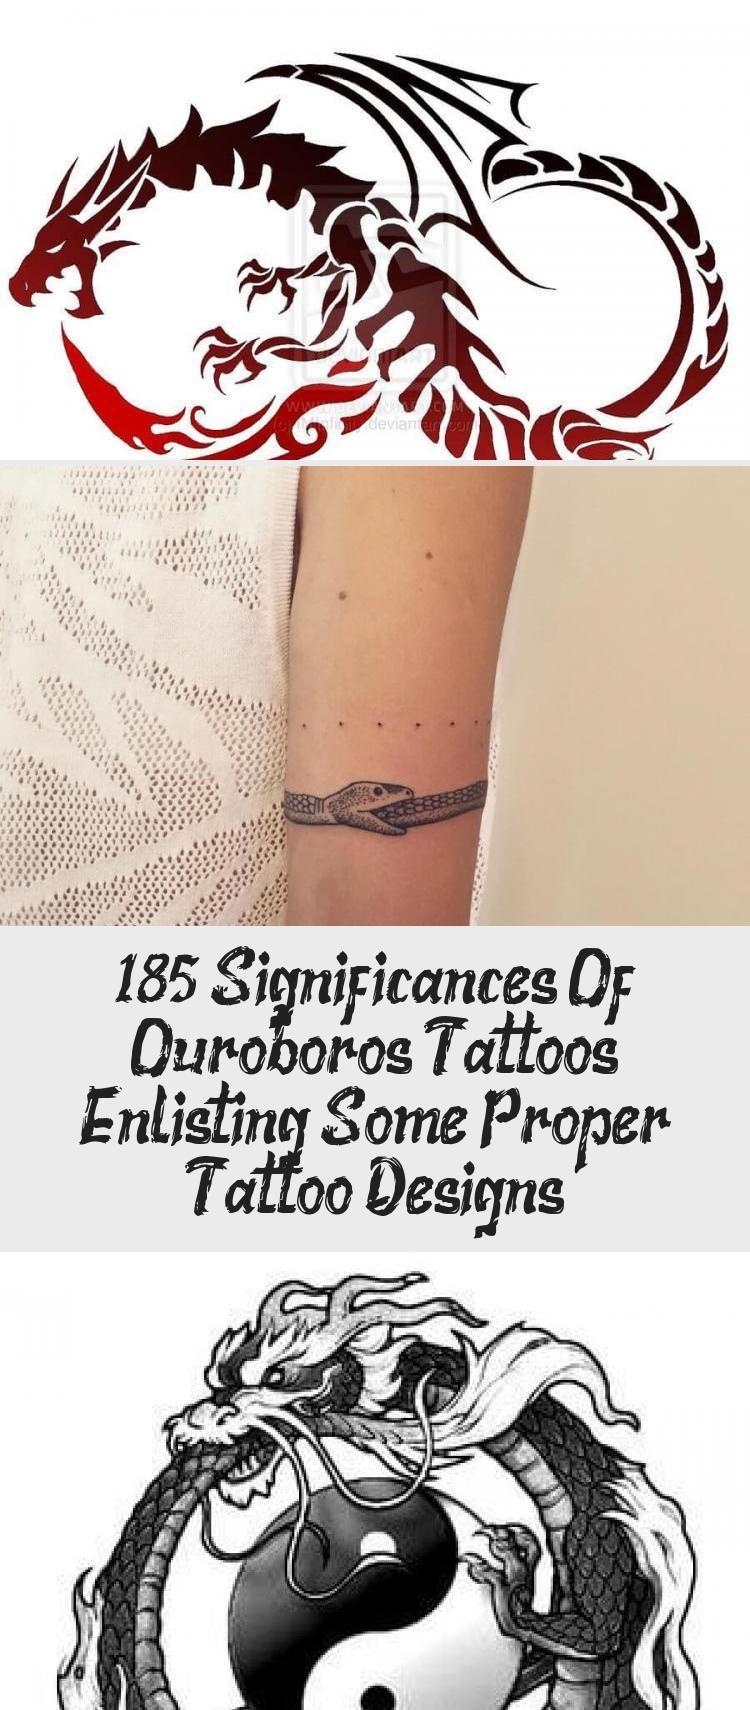 185 Significances Of Ouroboros Tattoos Enlisting Some Proper